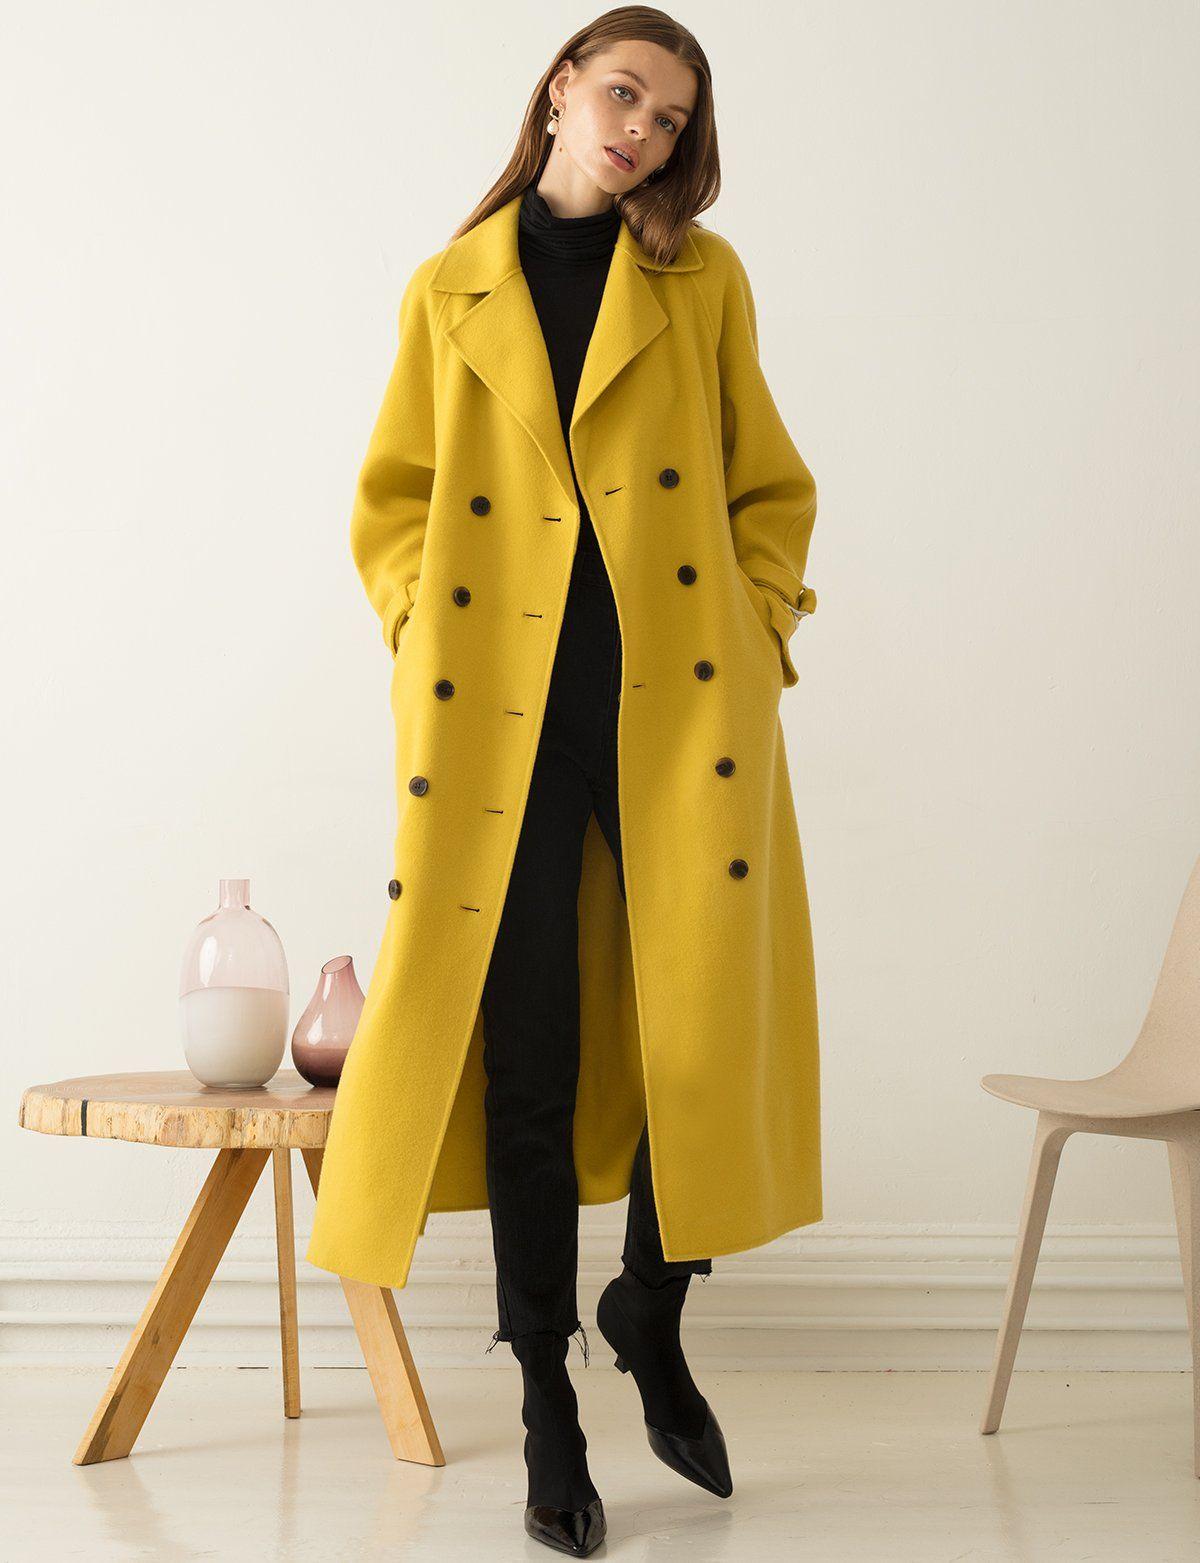 Yellow Wool Long Coat Long Wool Coat Yellow Coat Outfit Winter Coat Outfits